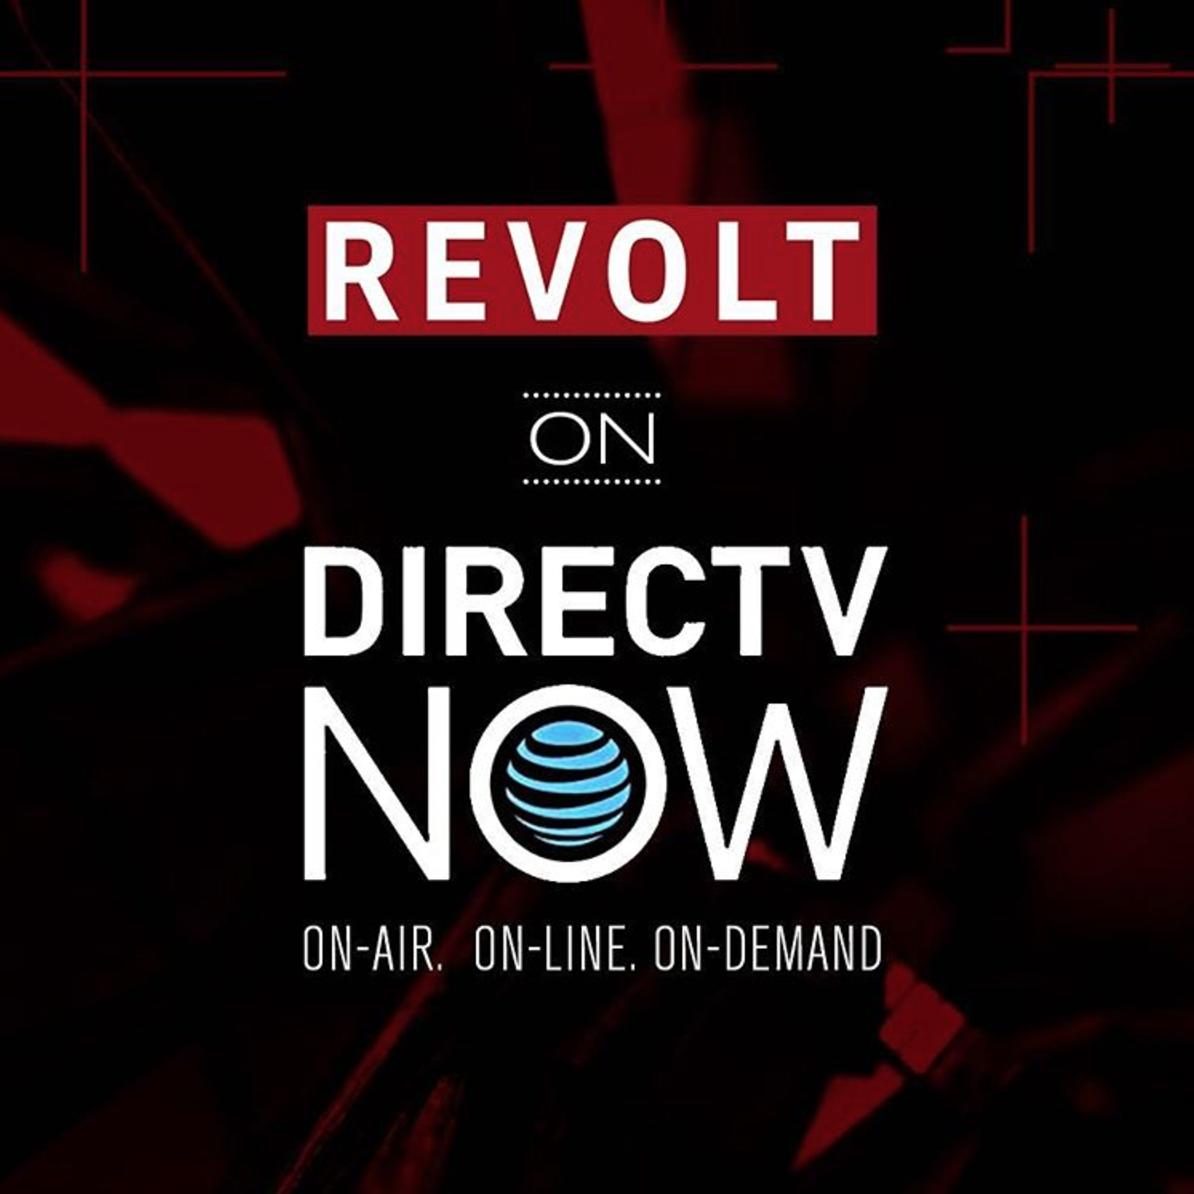 REVOLT now available onDirecTV.[20]